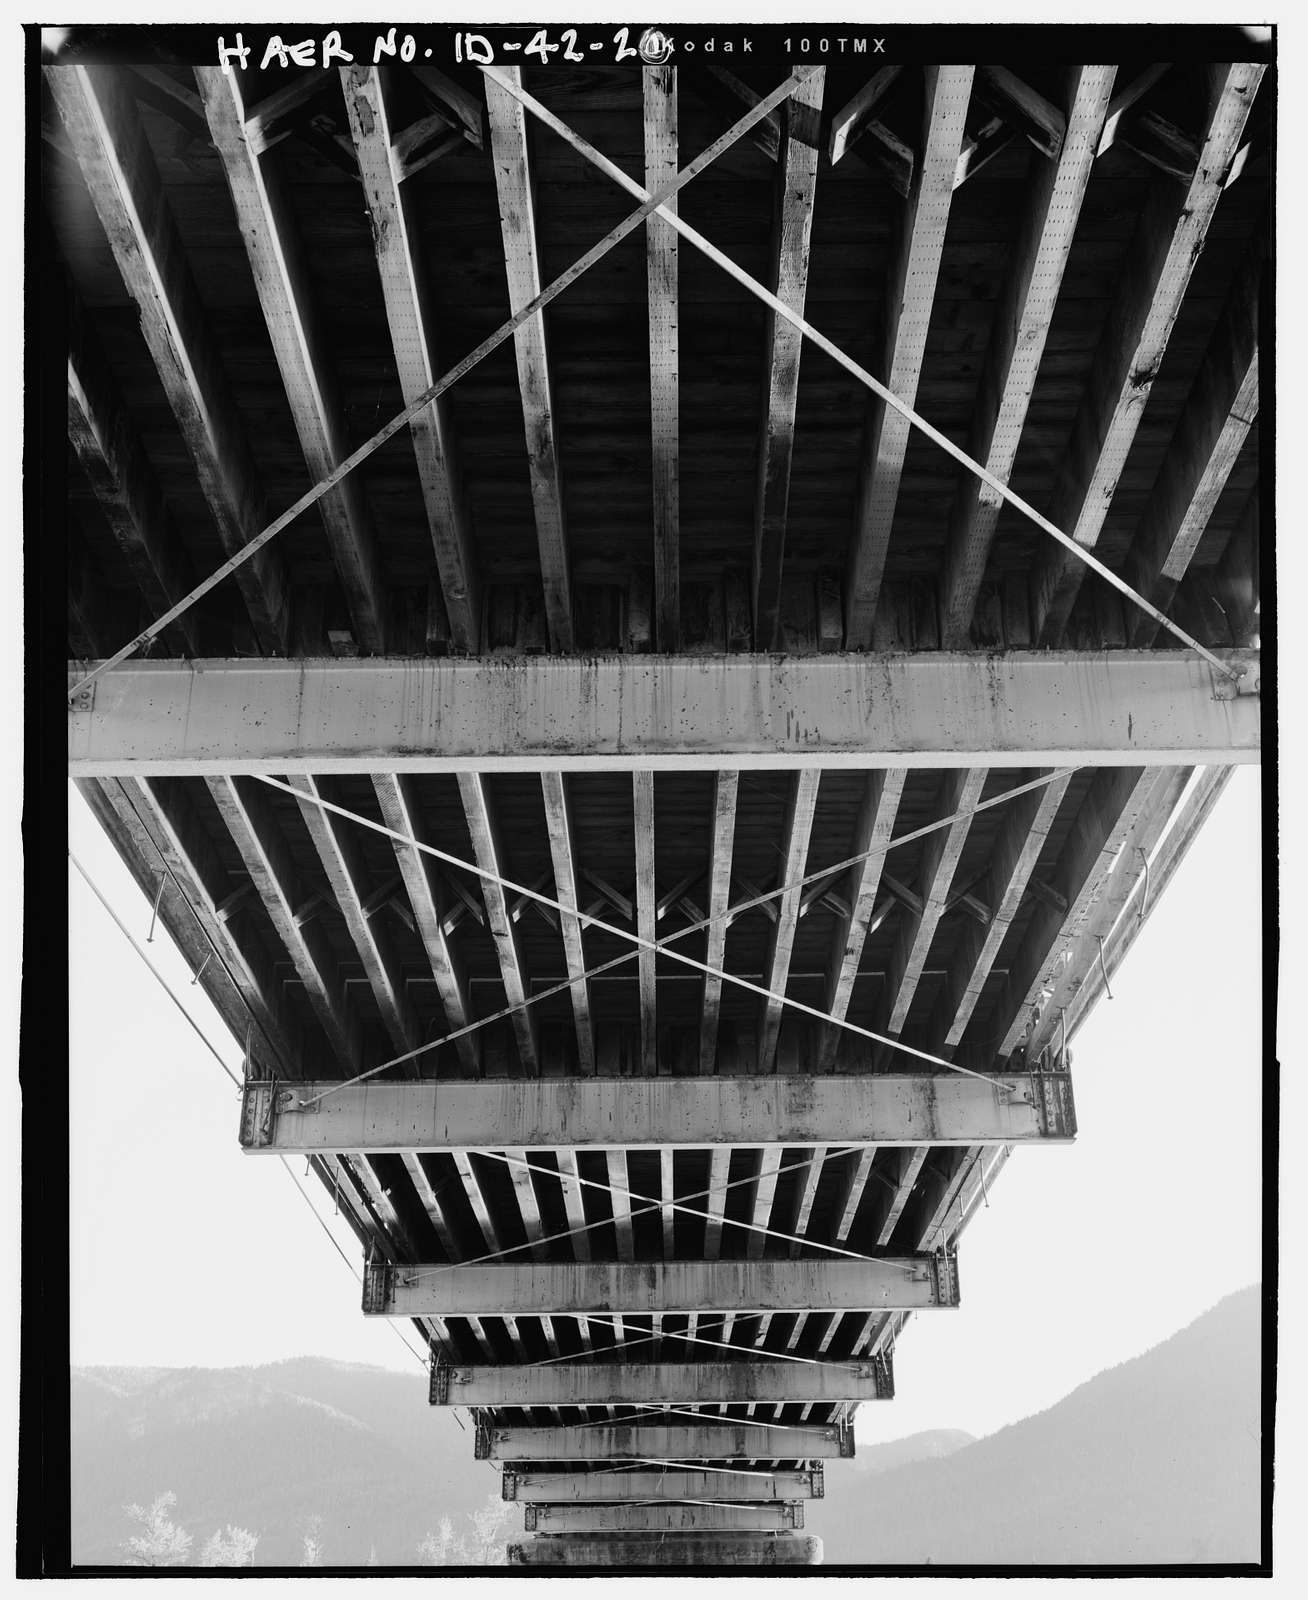 Clark Fork Vehicle Bridge, Spanning Clark Fork River, serves Highway 200, Clark Fork, Bonner County, ID